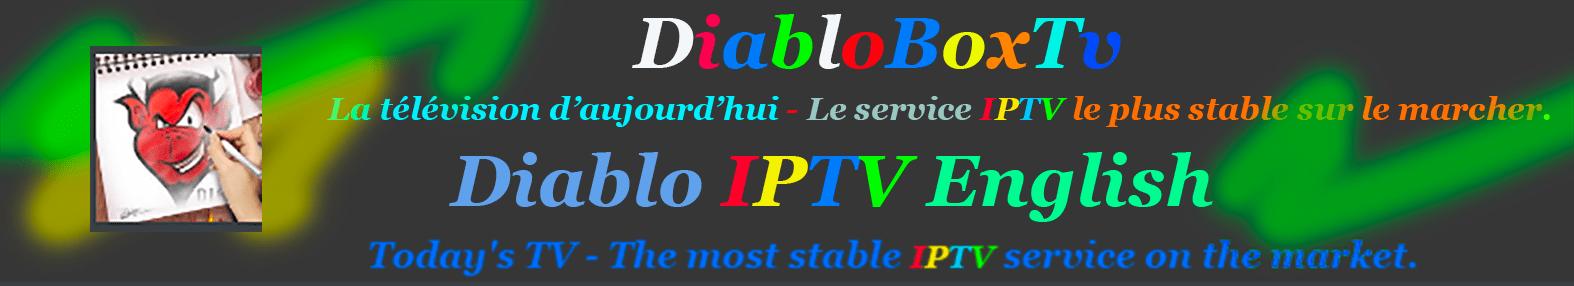 DiabloBoxTV.ca